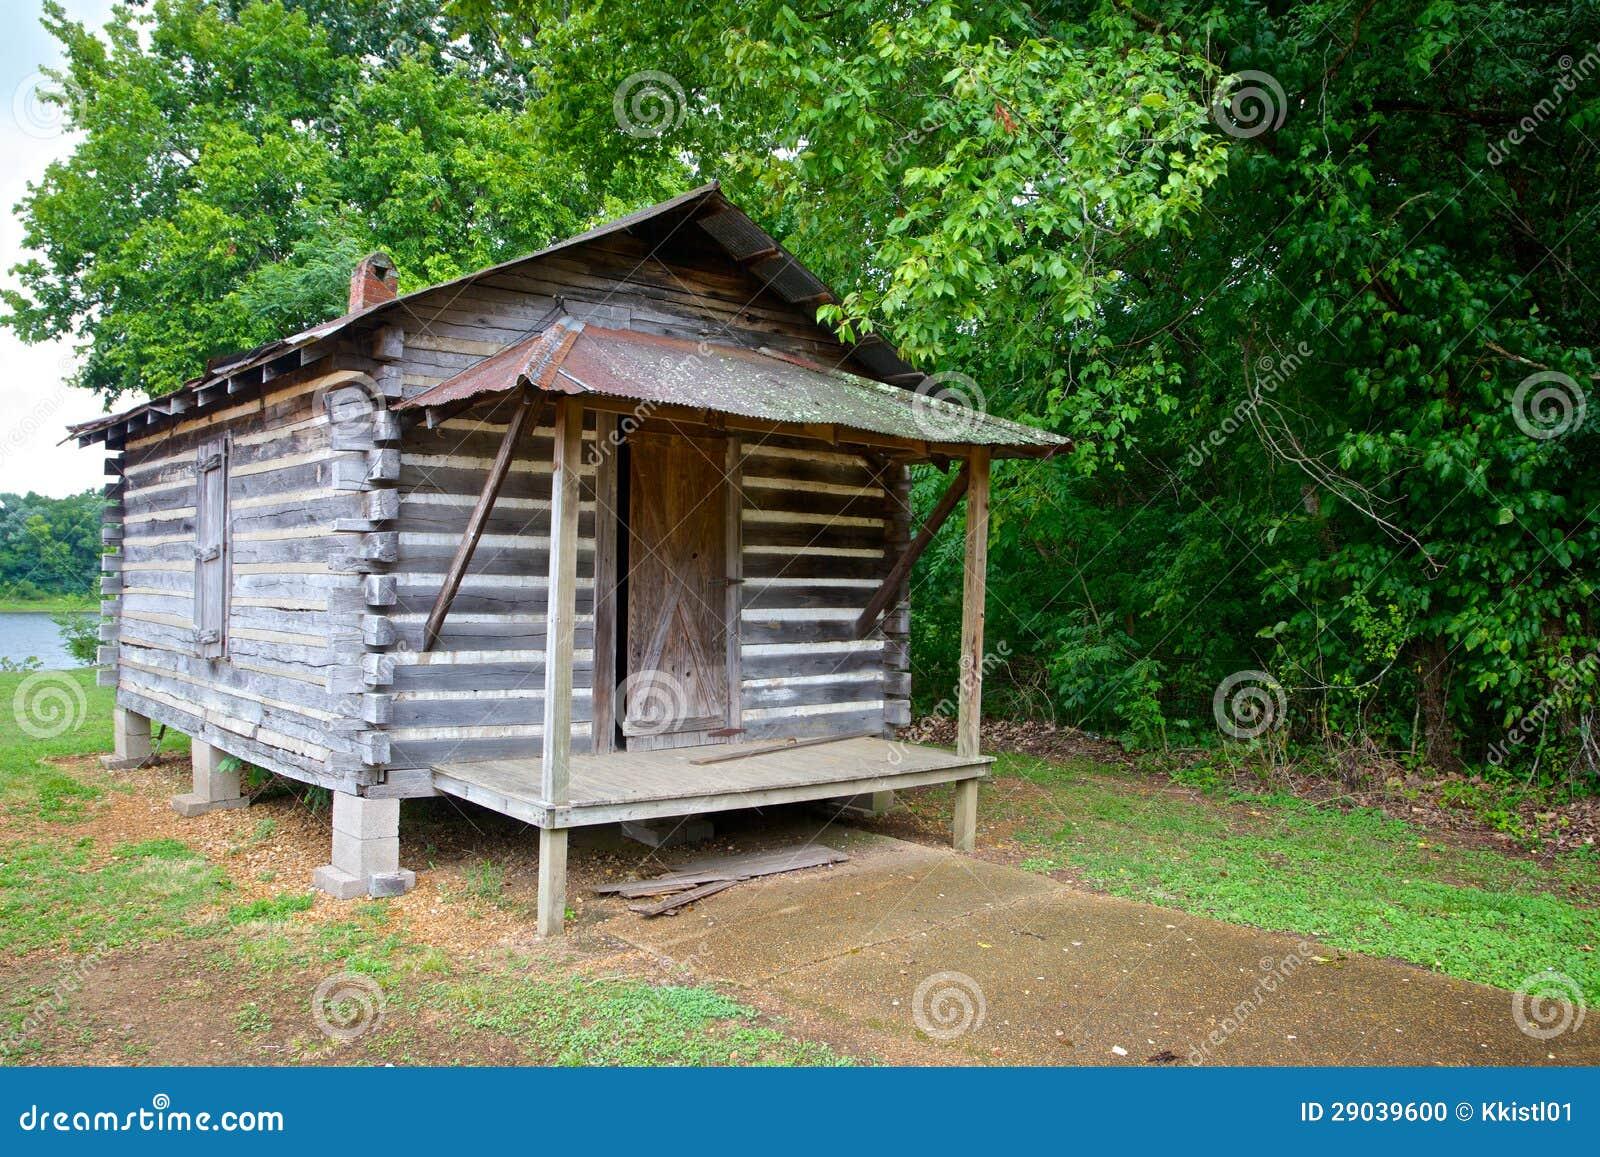 Log Cabin On Wood 39 S Edge Stock Photo Image Of Battlefield